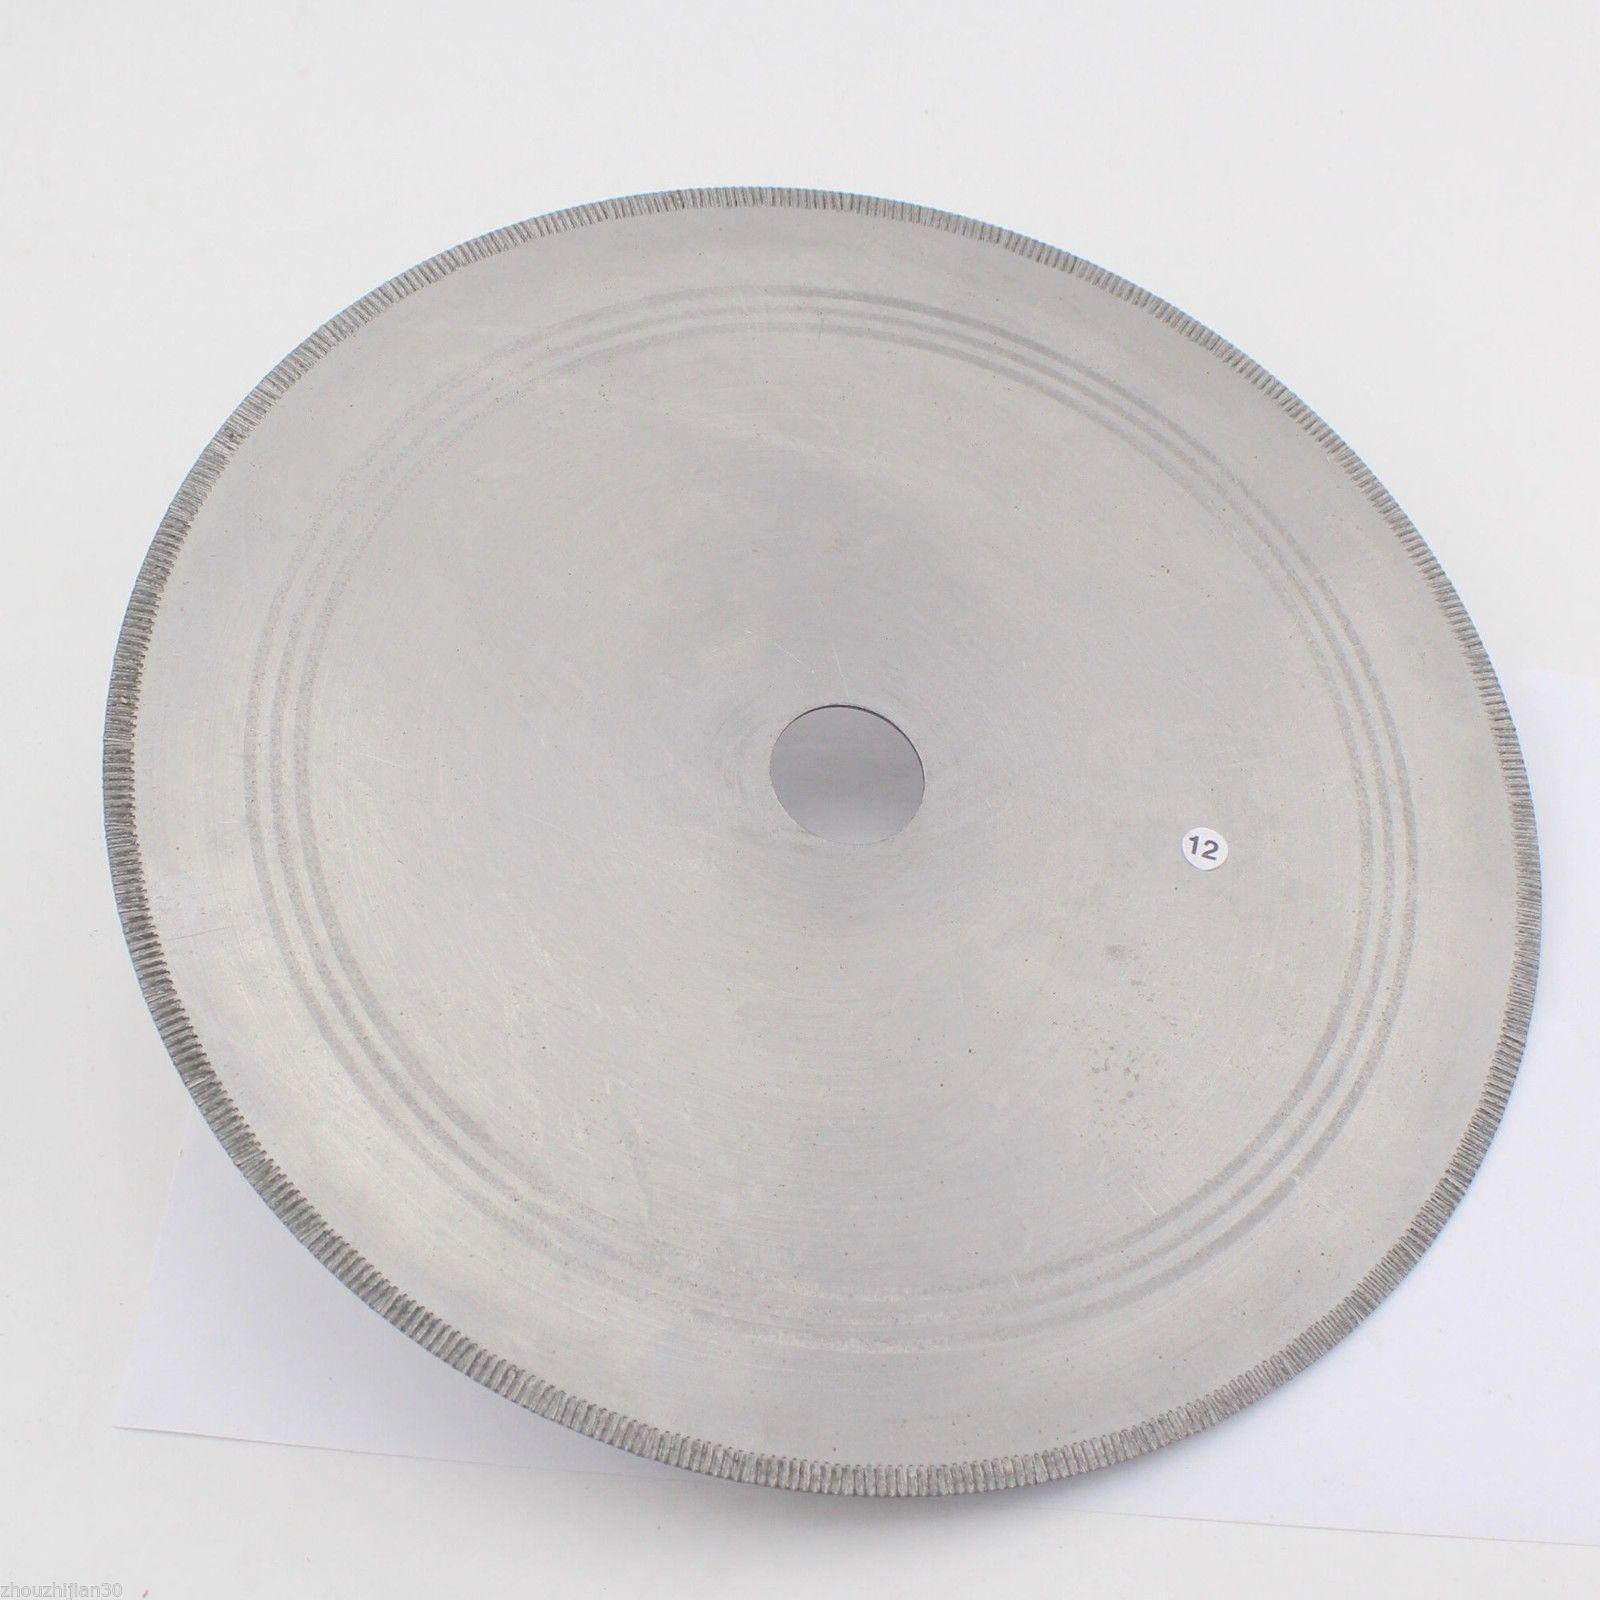 16 inch Lapidary Diamond Saw Blade Notched Rim 1.6mm Rock Slab Arbor 1 inch ILOVETOOL fiori